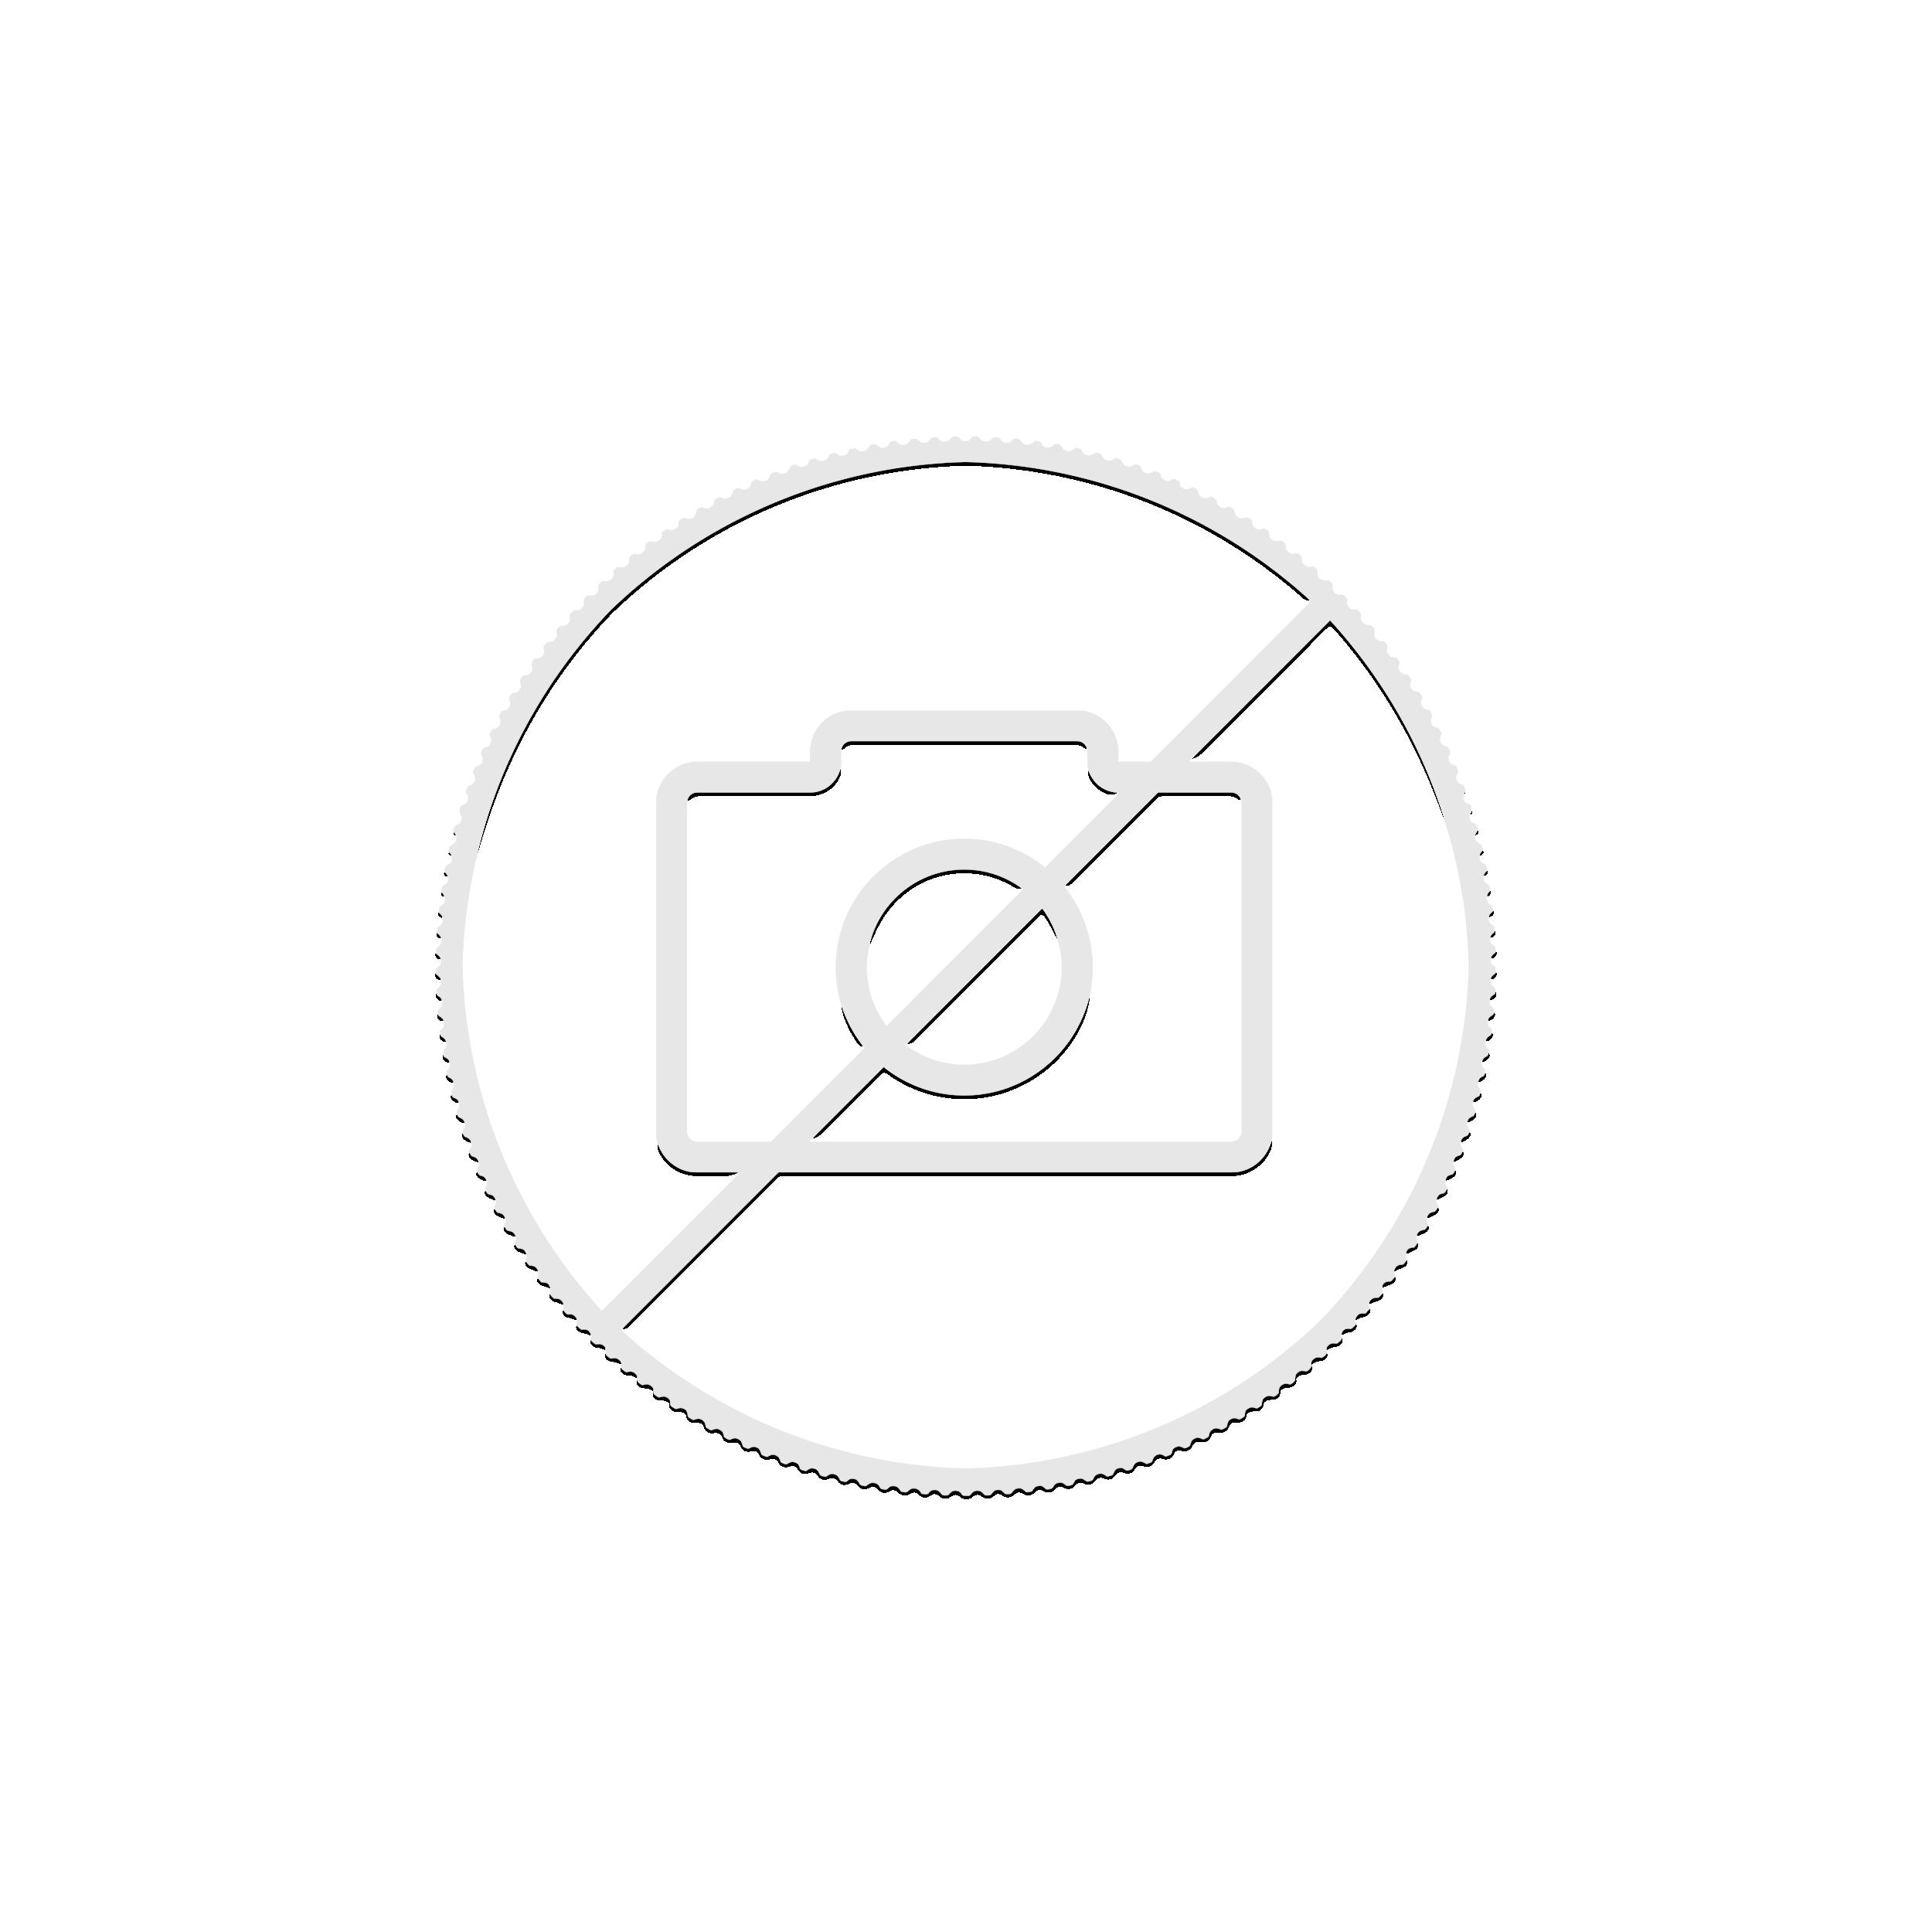 2 troy ounce zilveren munt Mandala Owl - antieke afwerking 2020